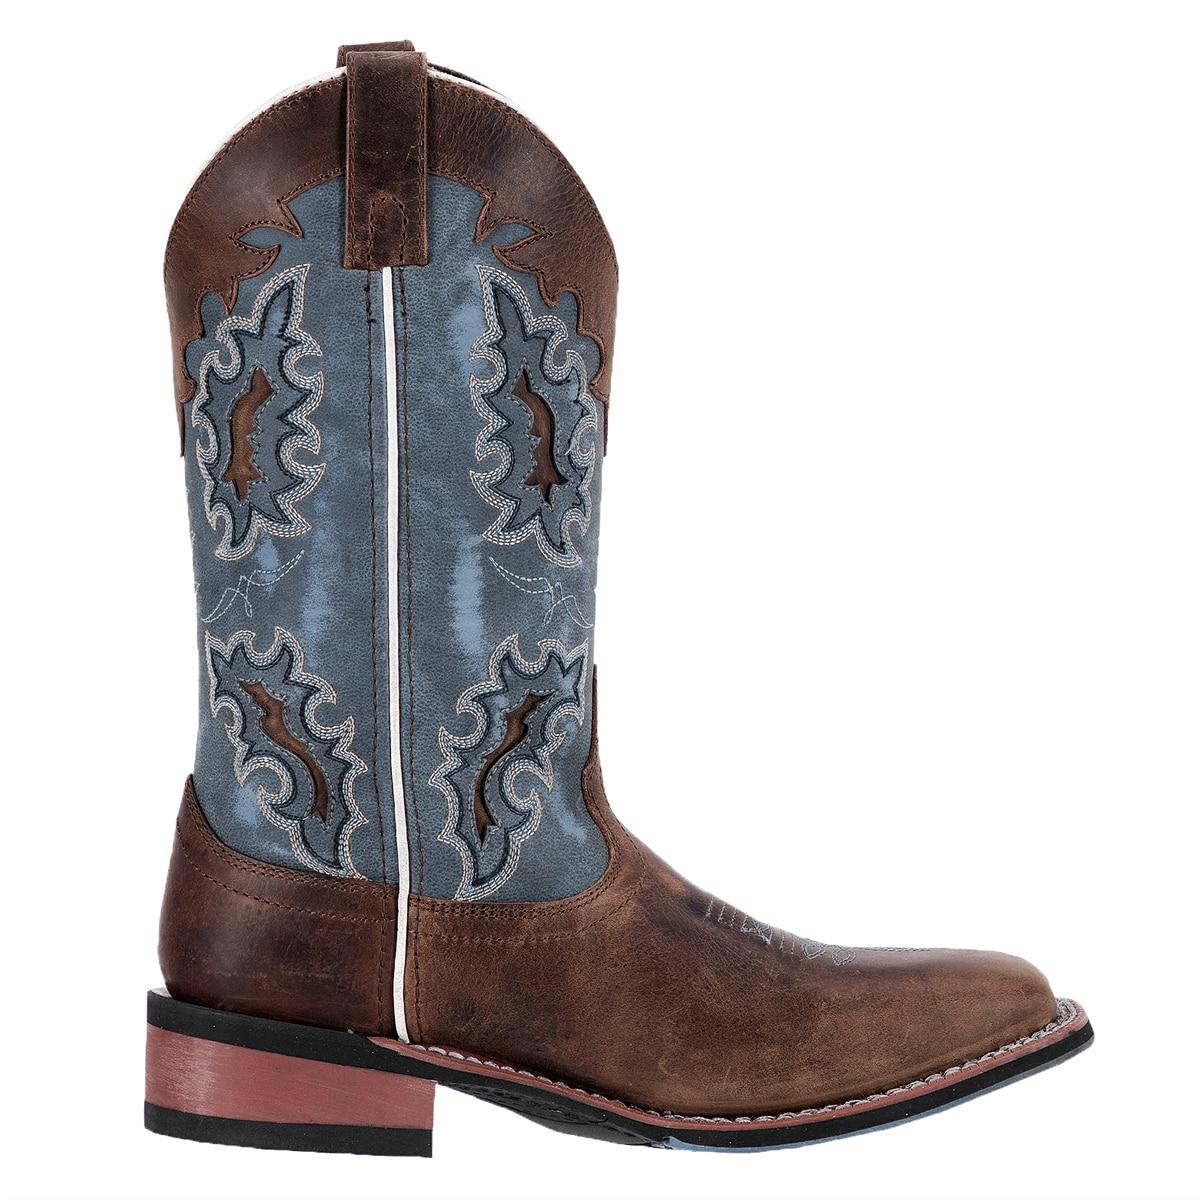 7b19e2294f5 Laredo Women's Isla Boots